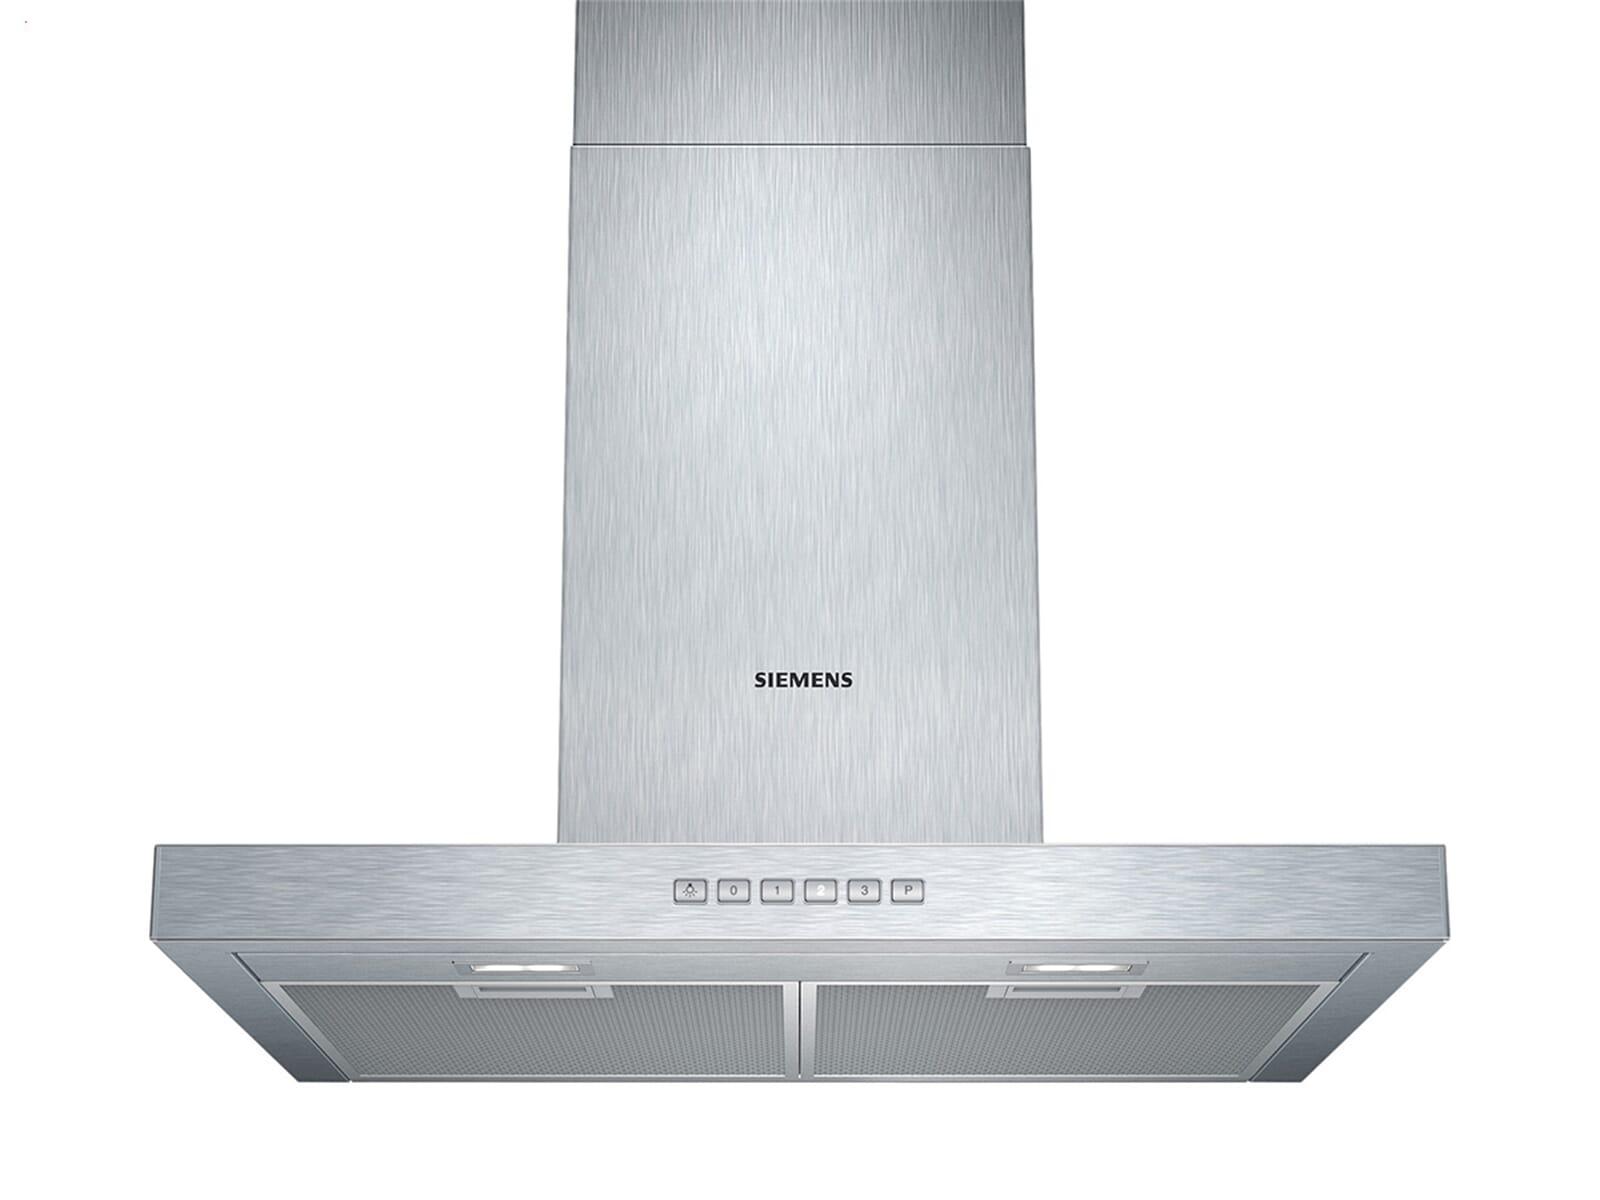 Siemens LC67BC532 Wand Küchenhaube Edelstahl LED Beleuchtung Dunstabzug eBay